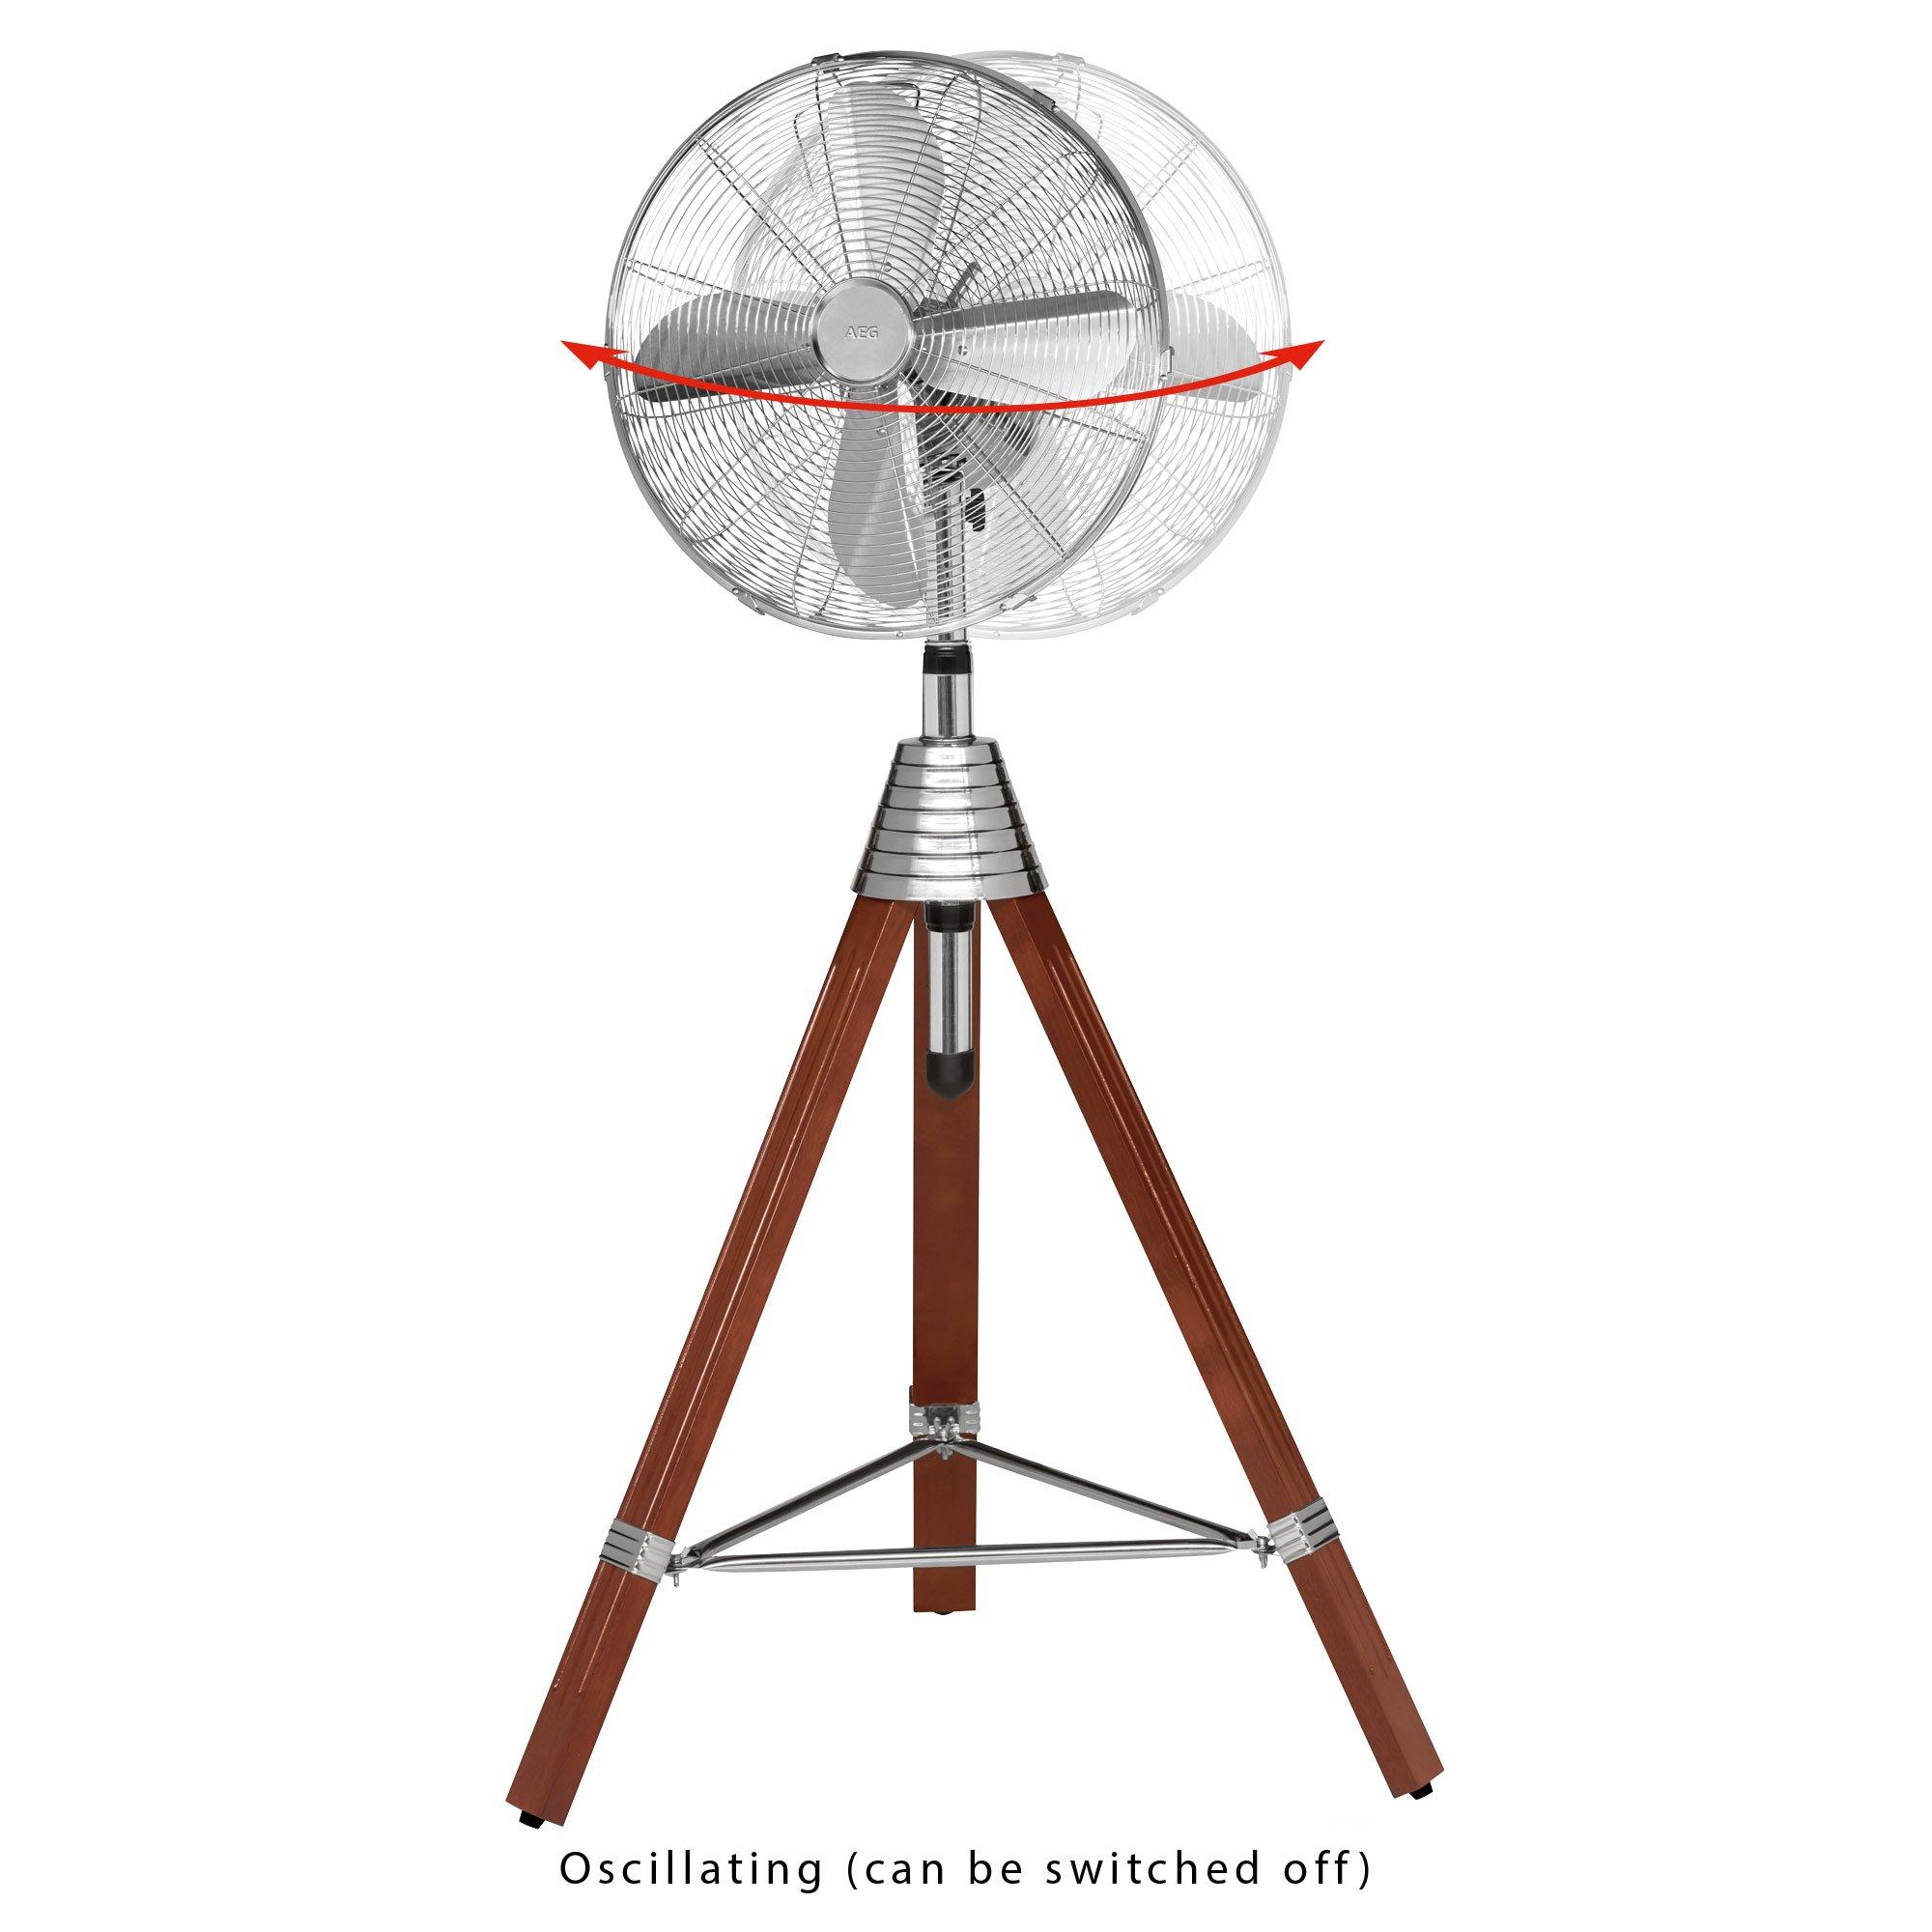 AEG VL 5688 S Ventilador de pie de estilo Retro, trípode de madera ...